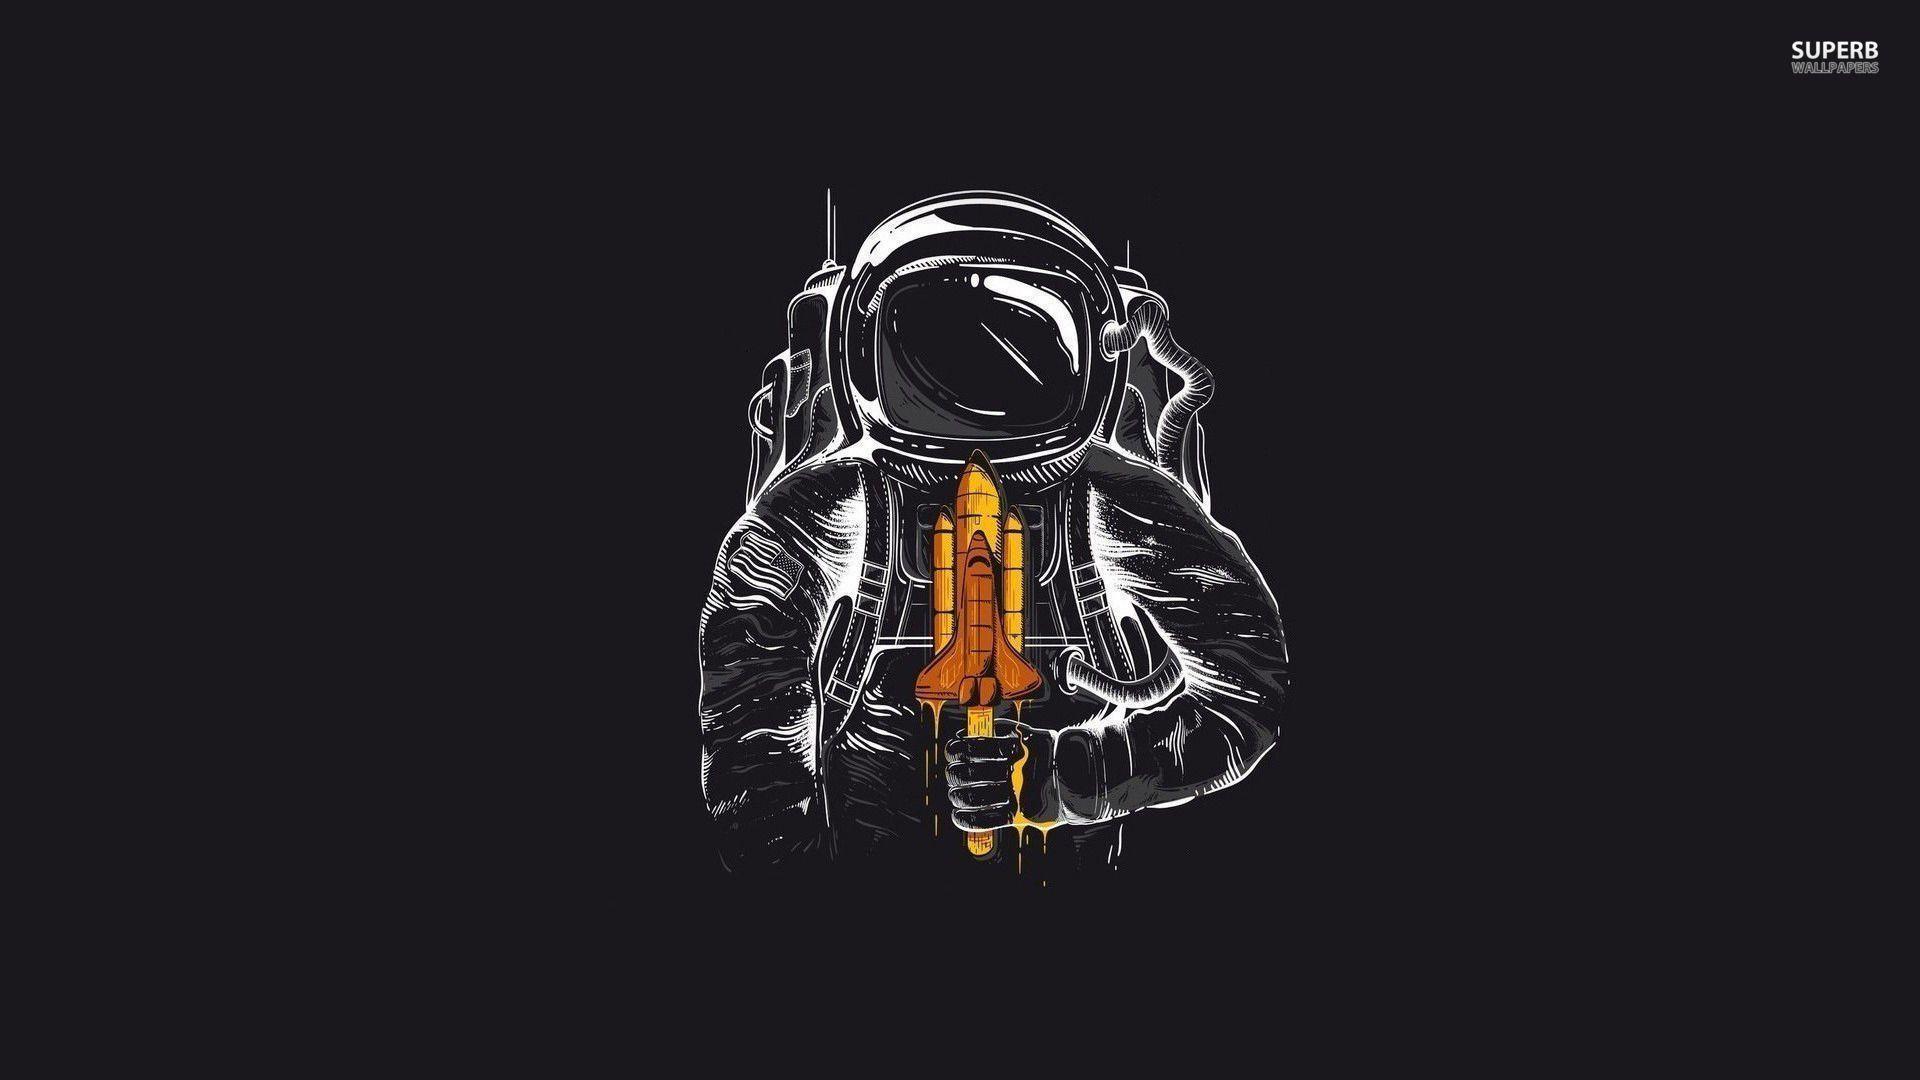 astronaut black background - photo #30